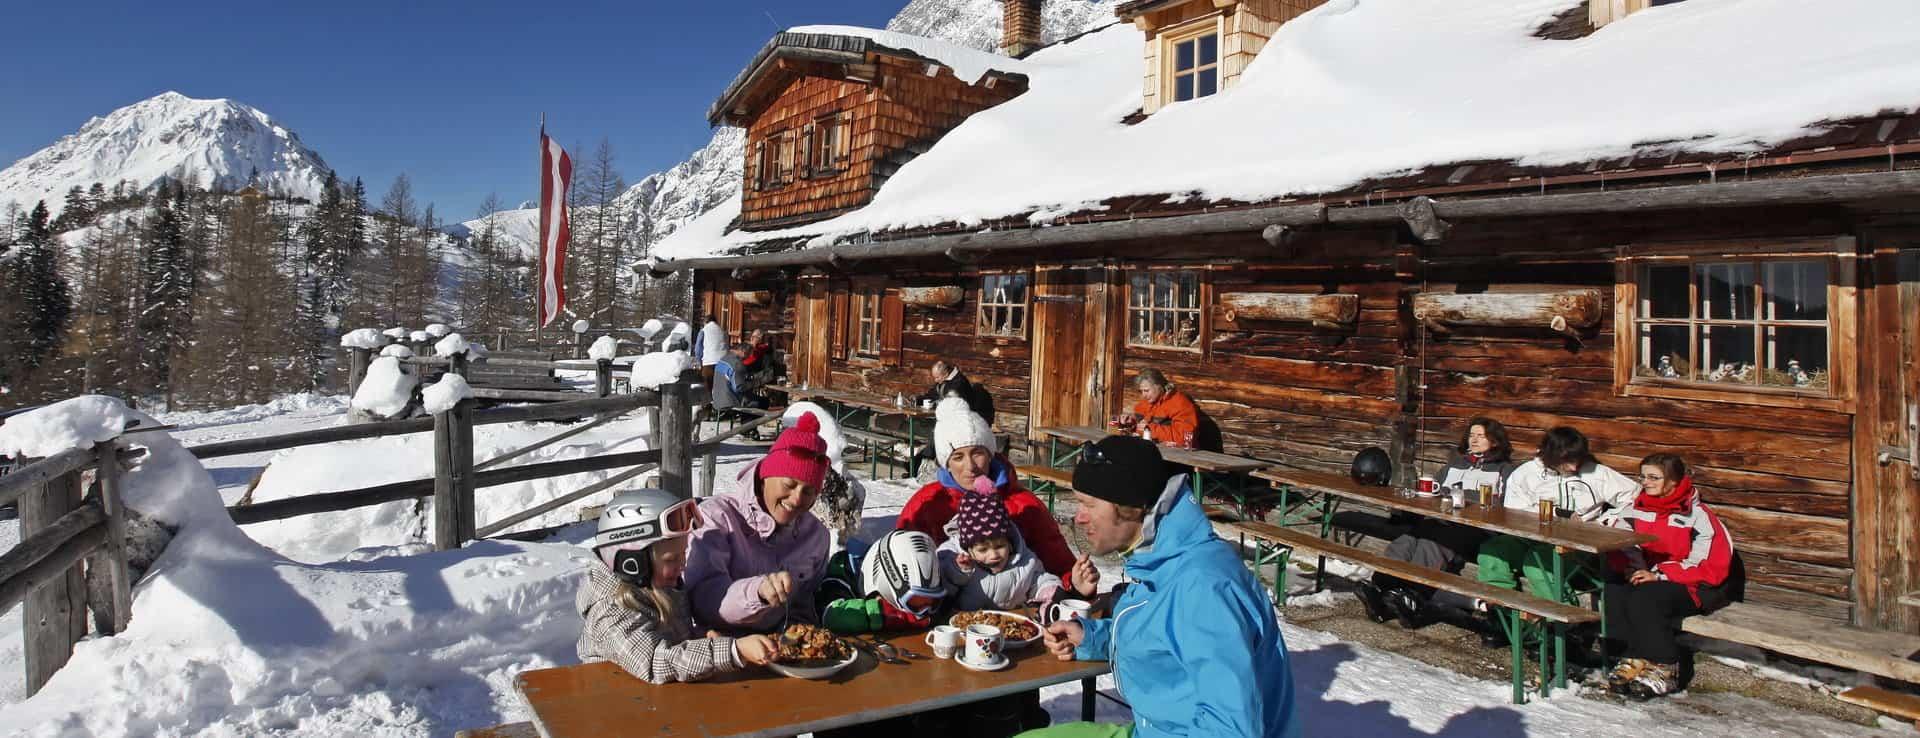 Skidsemester med Austria Travel - Paus i mysig Hütte